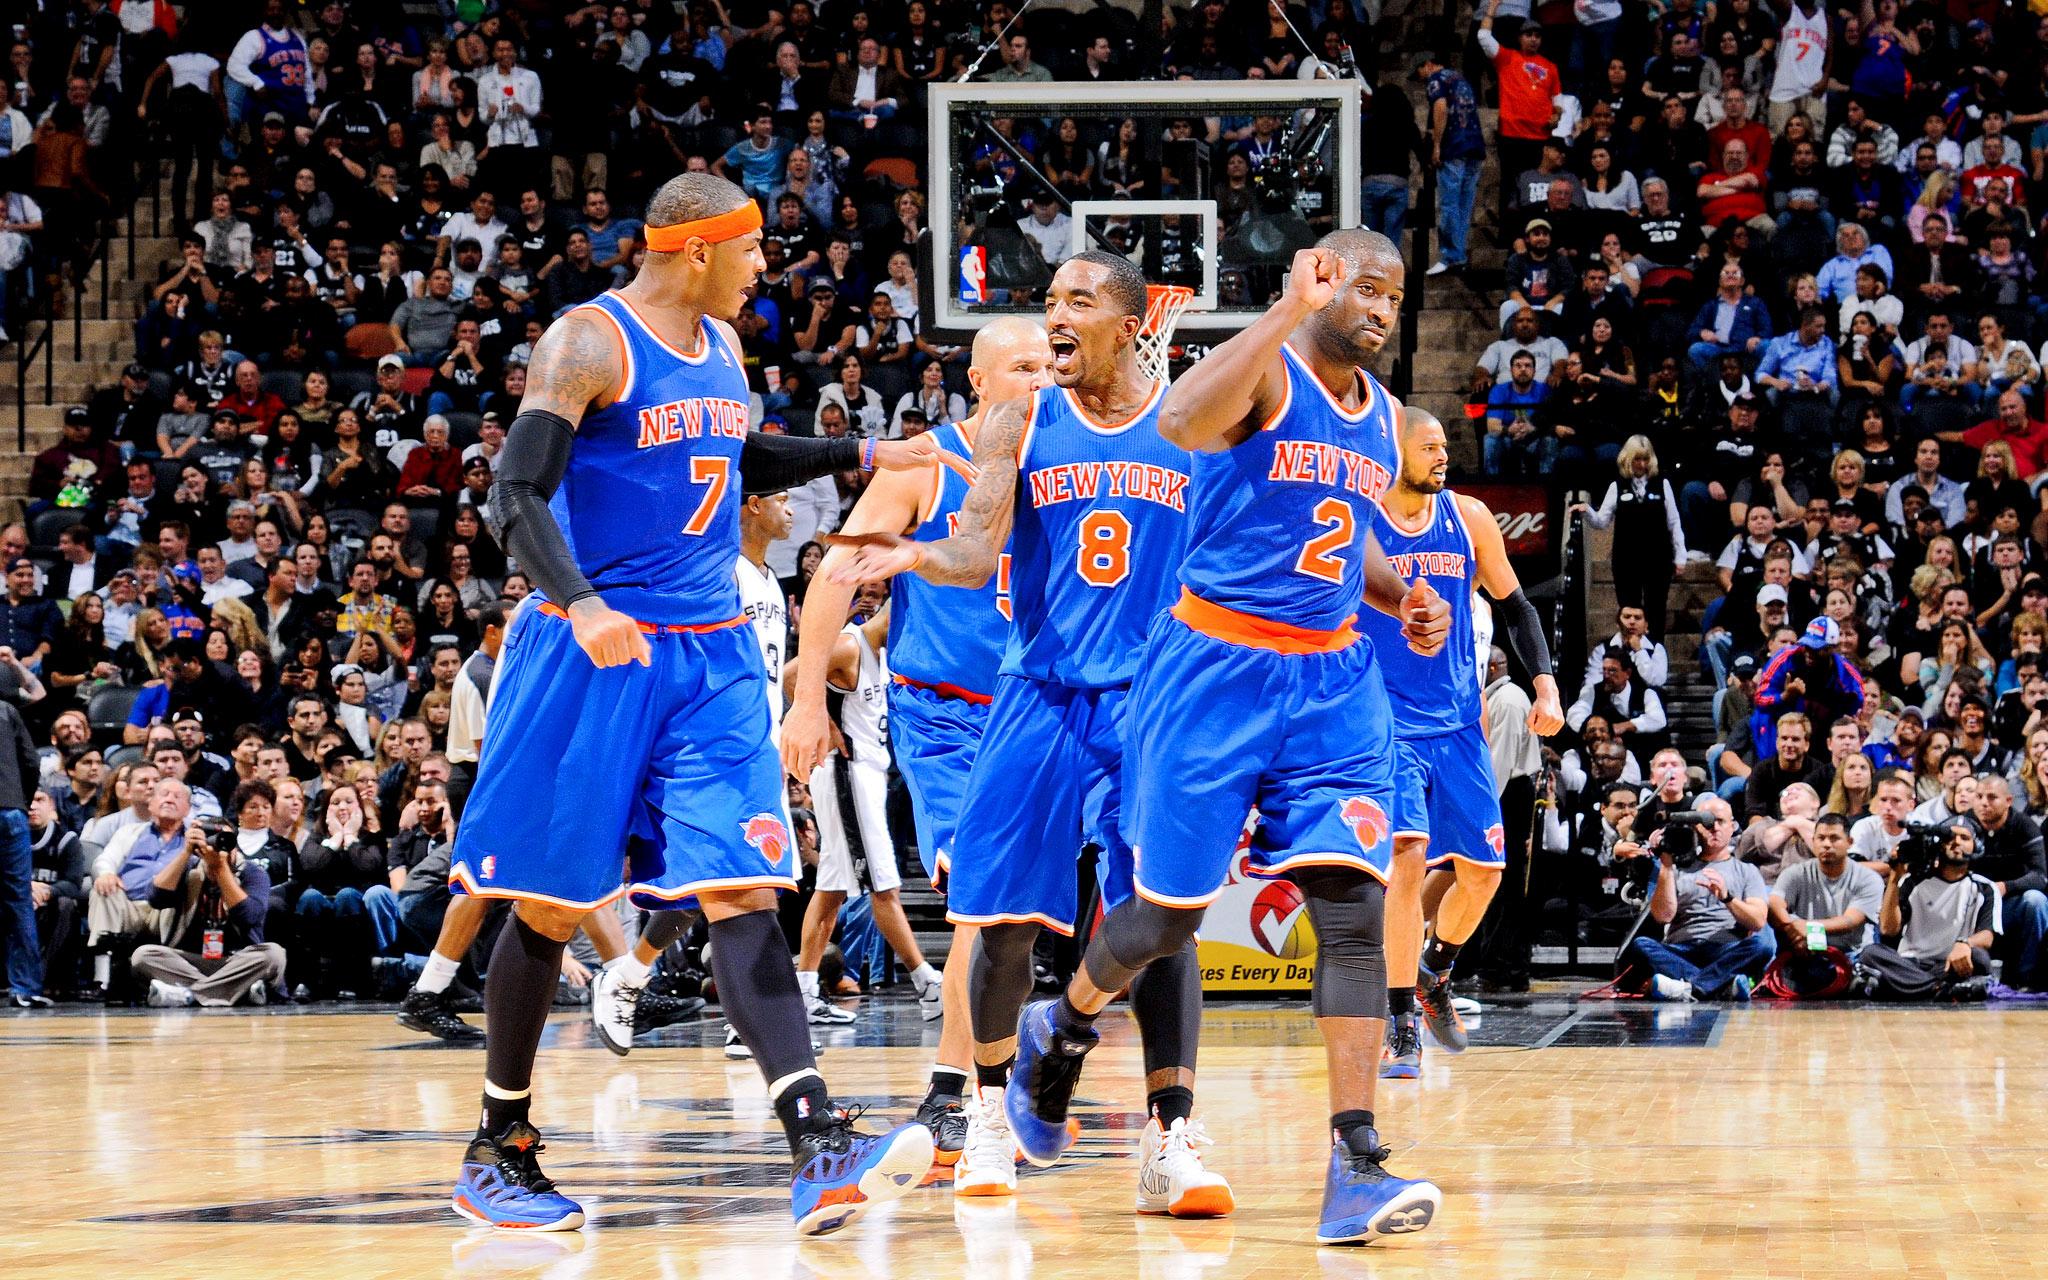 Nba Basketball New York Knicks: NEW YORK KNICKS Basketball Nba E Wallpaper